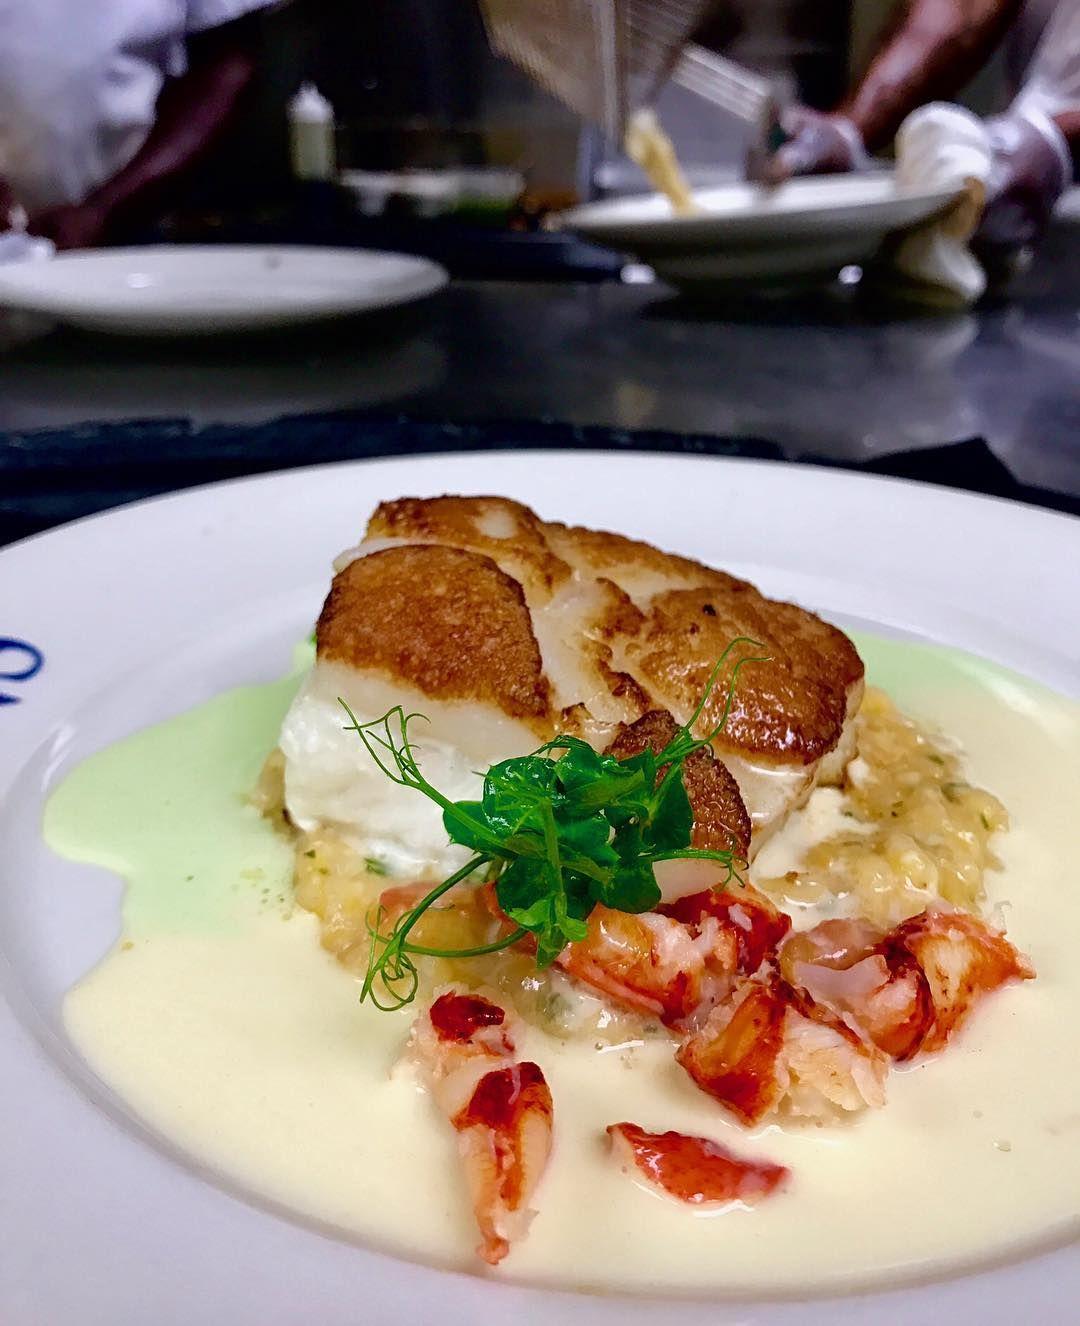 Scalibut At Gw Fins New Orleans La The Famous Seafood Restaurant Tops A